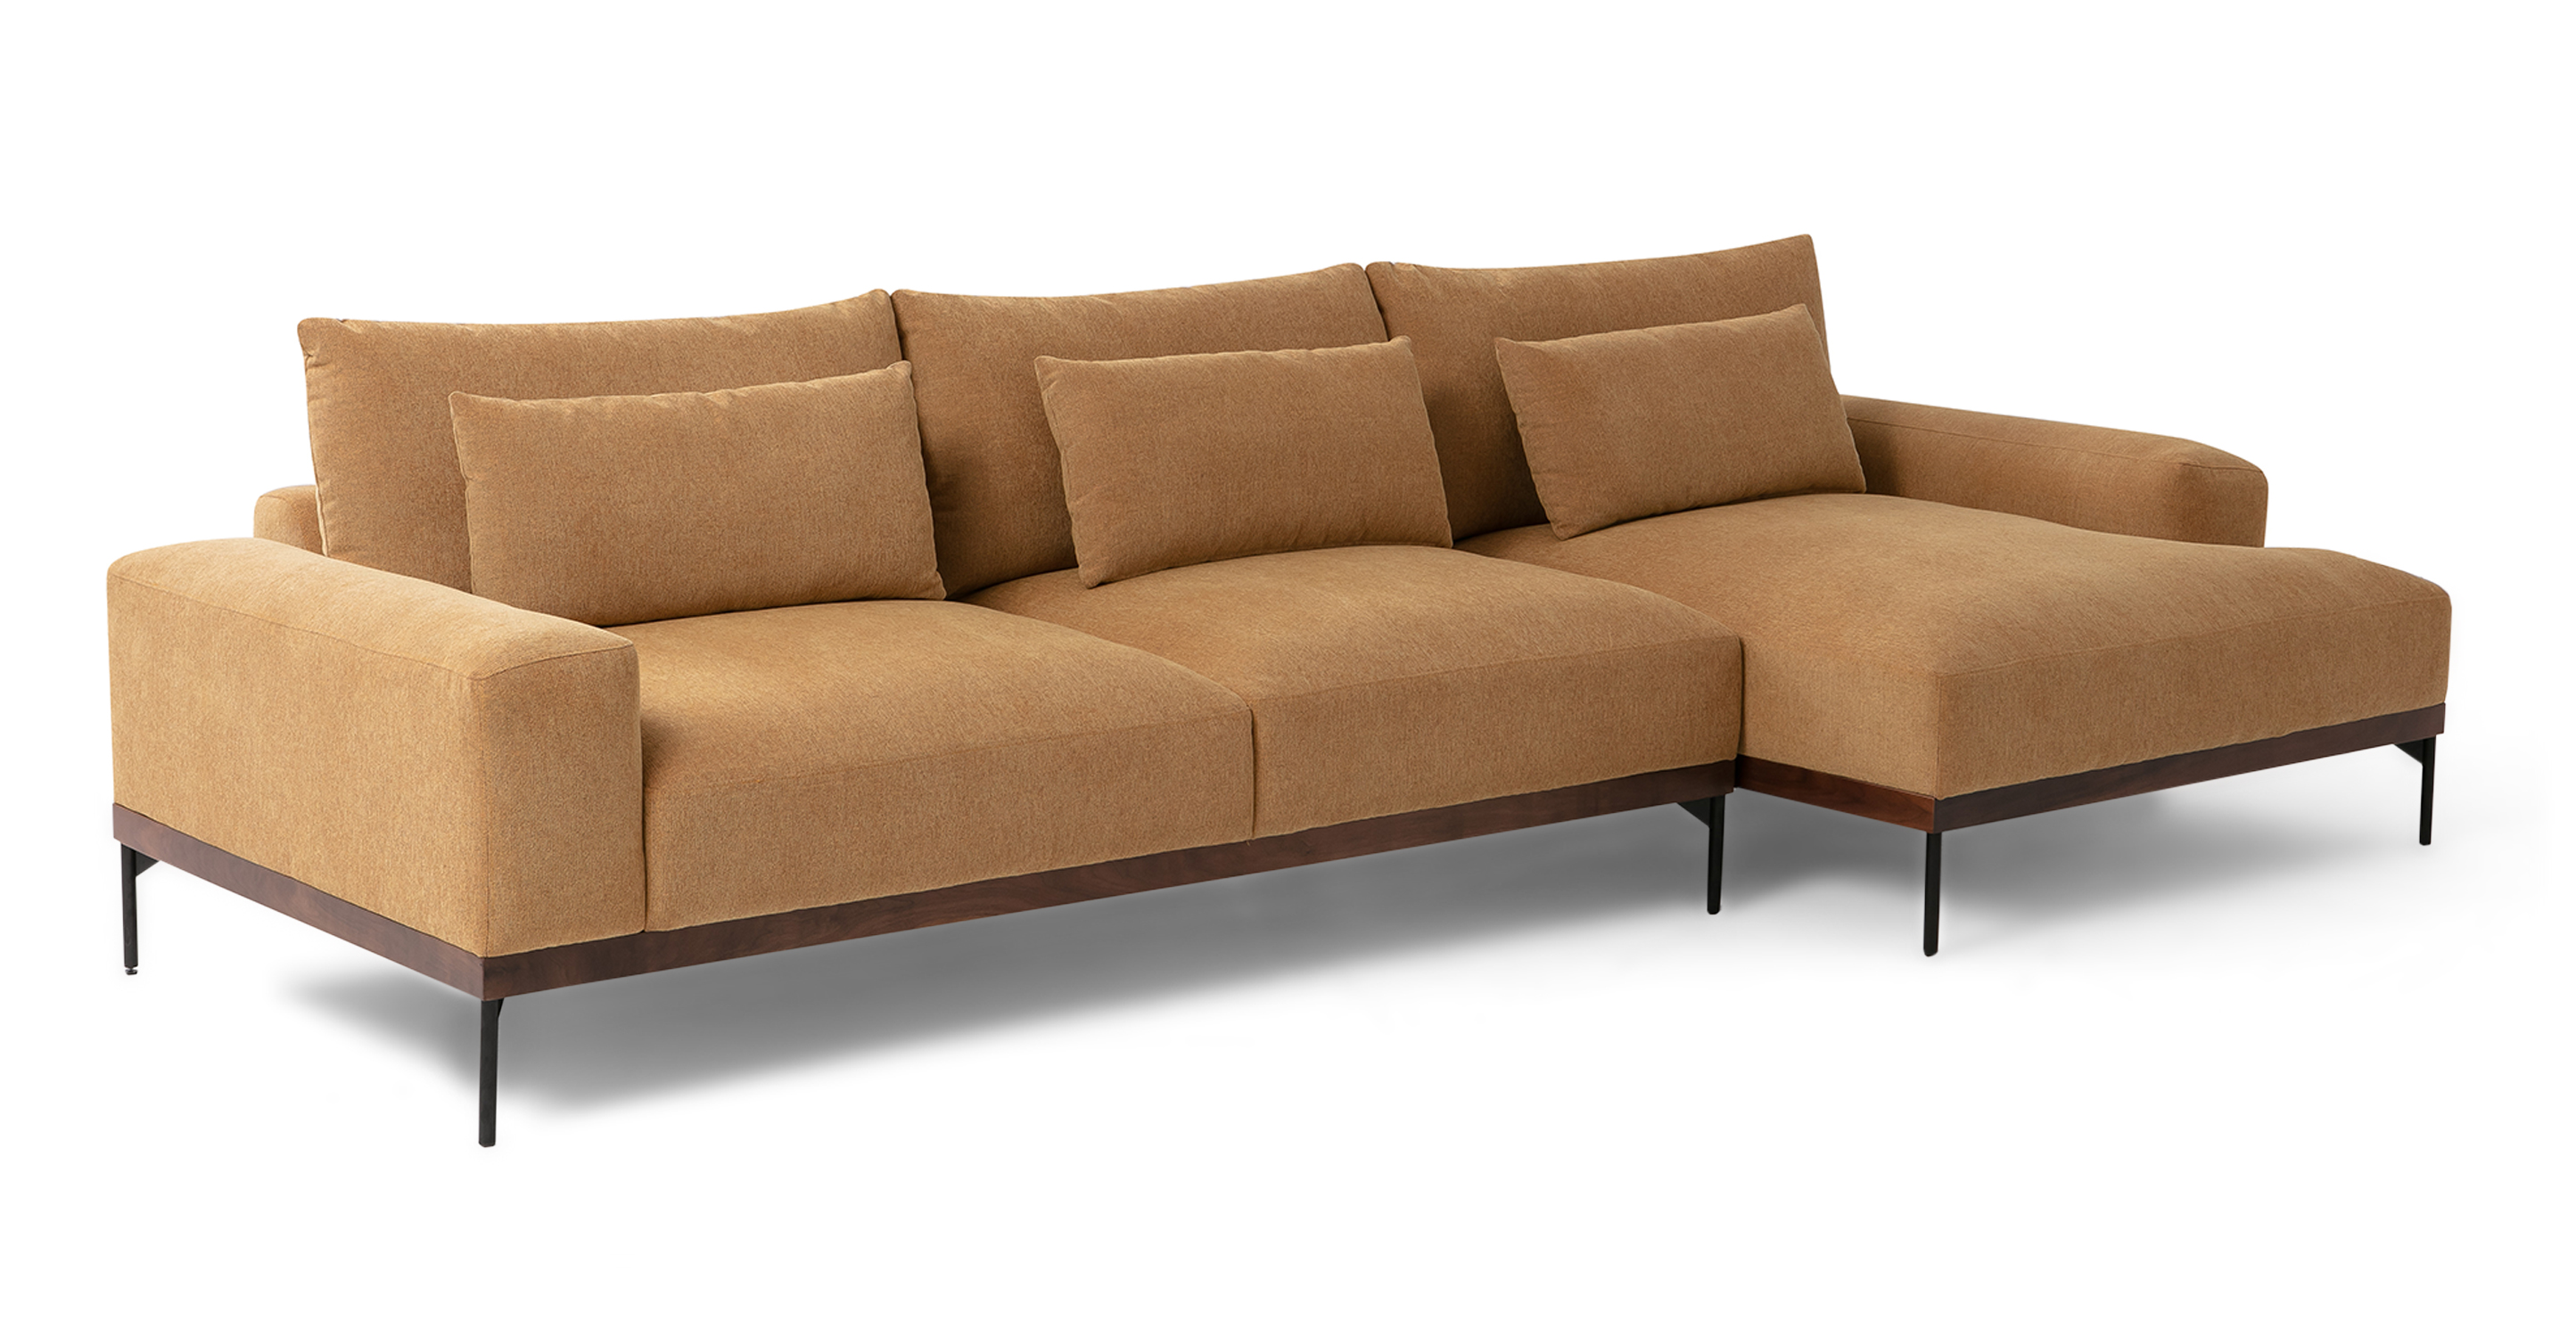 "Tate 122"" Fabric Sofa Sectional Right, Cumin"